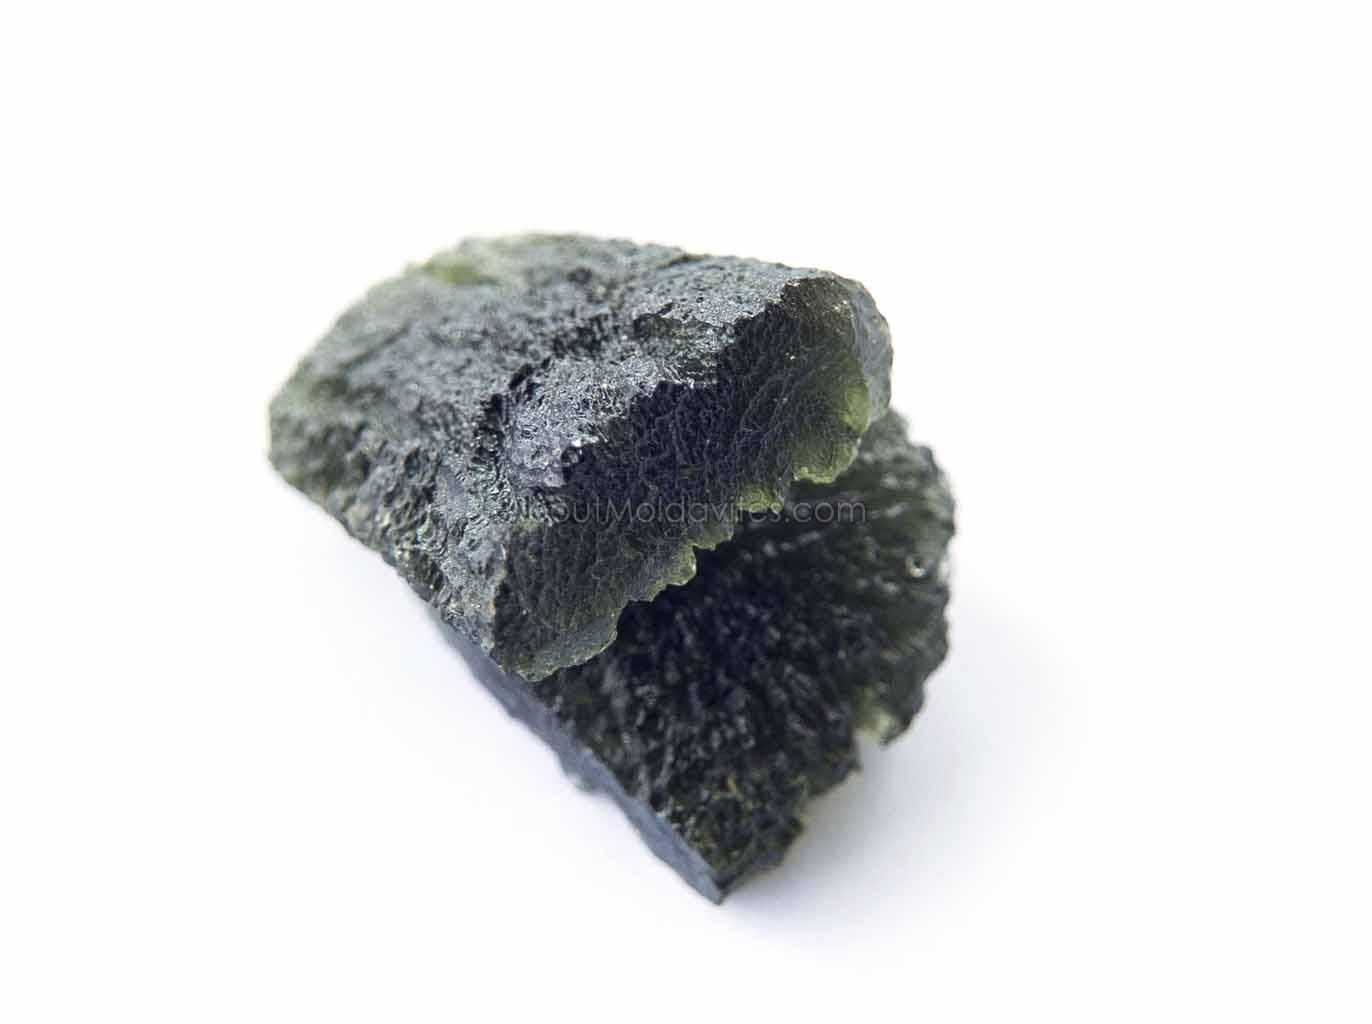 Naturally divided moldavites - drop